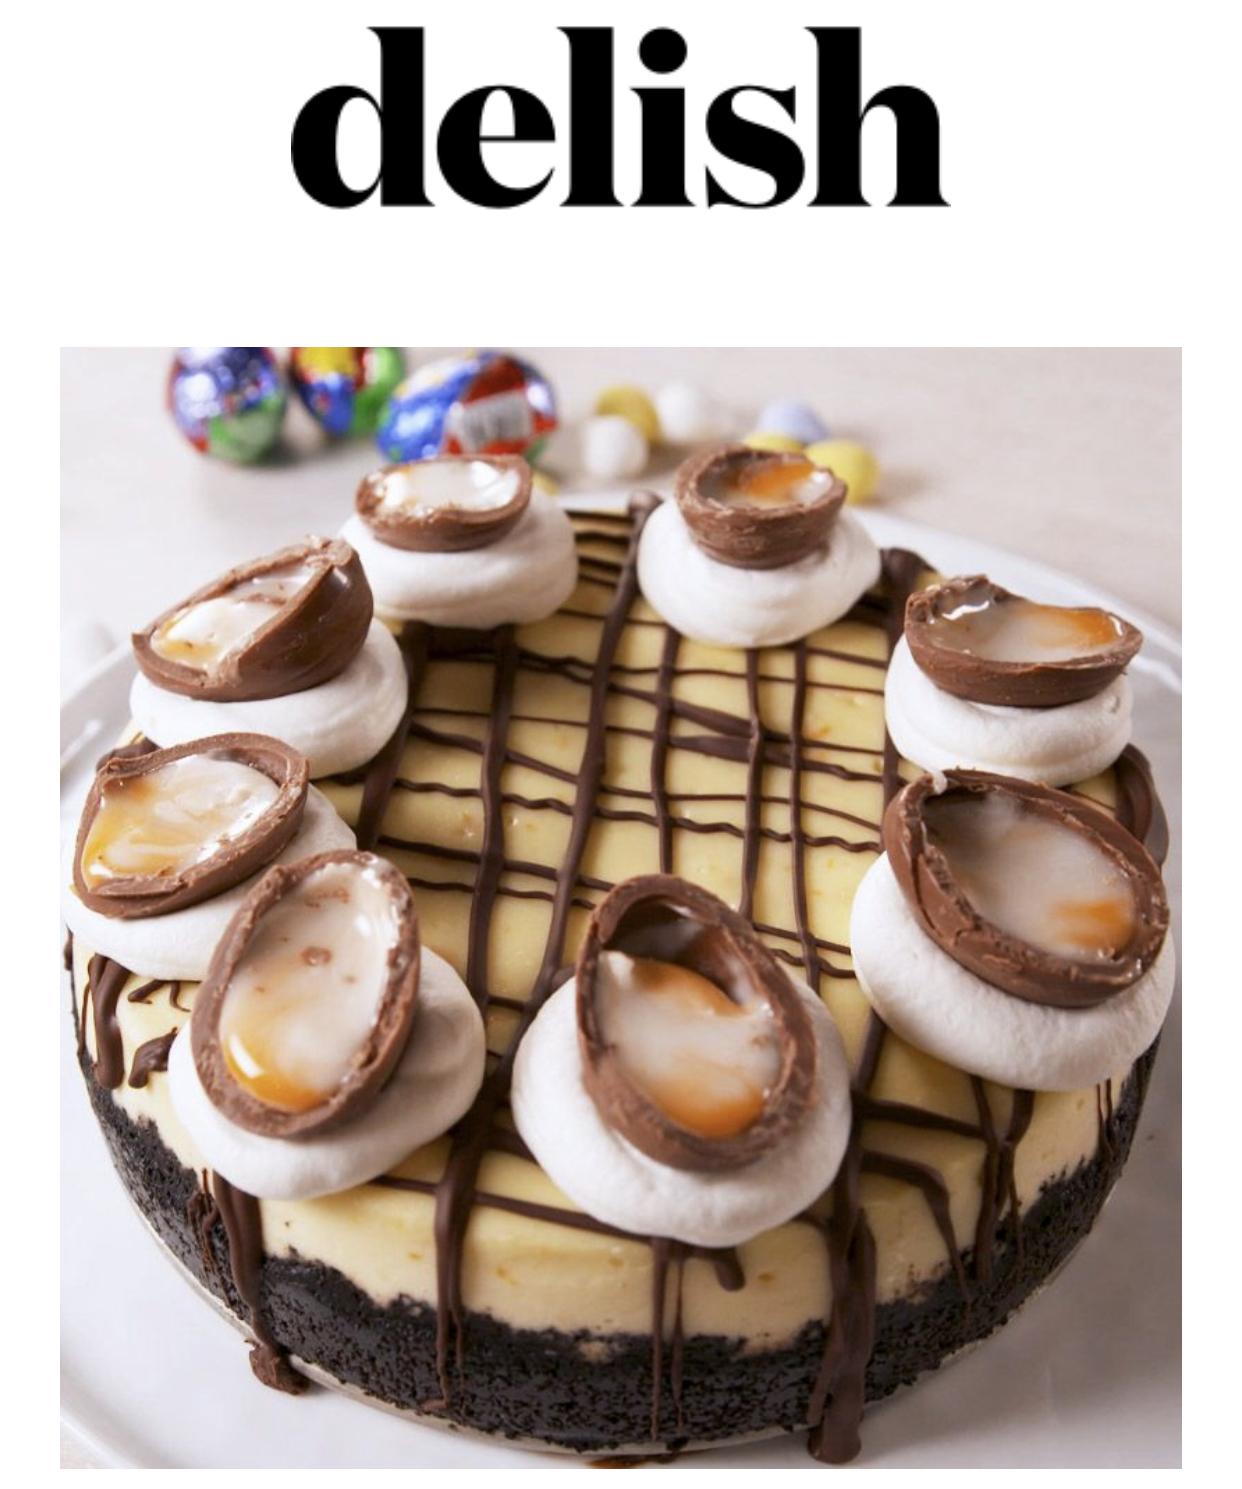 delish cheesecake.jpg